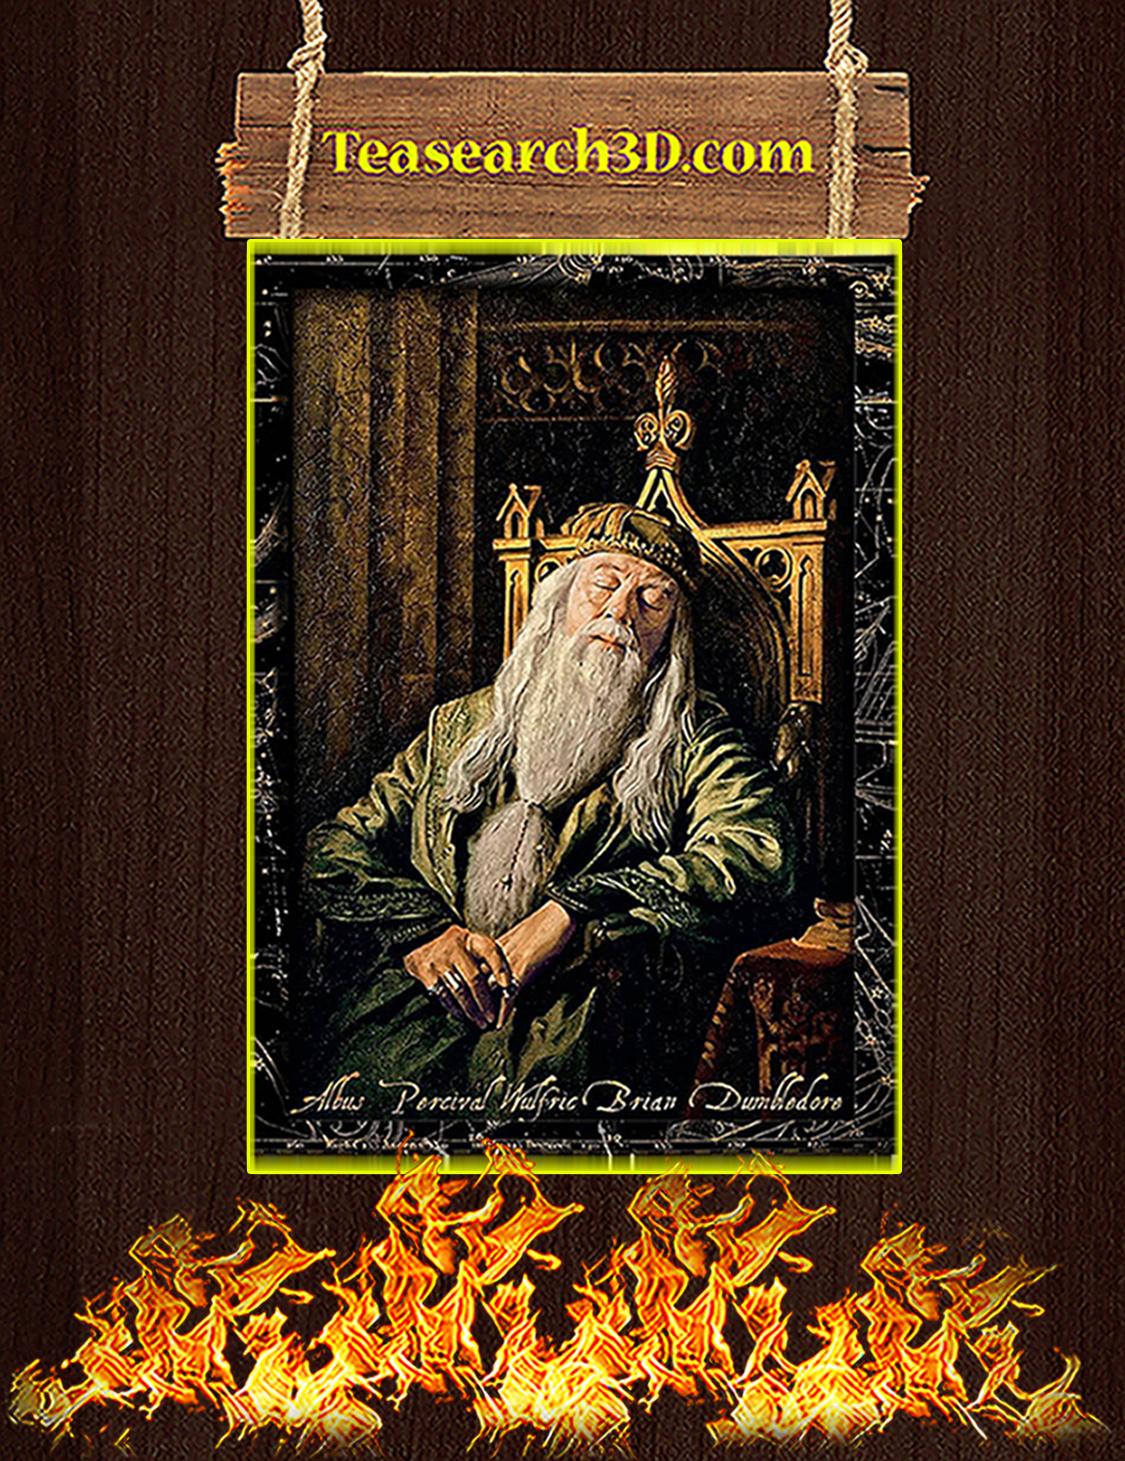 Albus percival wulfric brian dumbledore sleeping poster A3